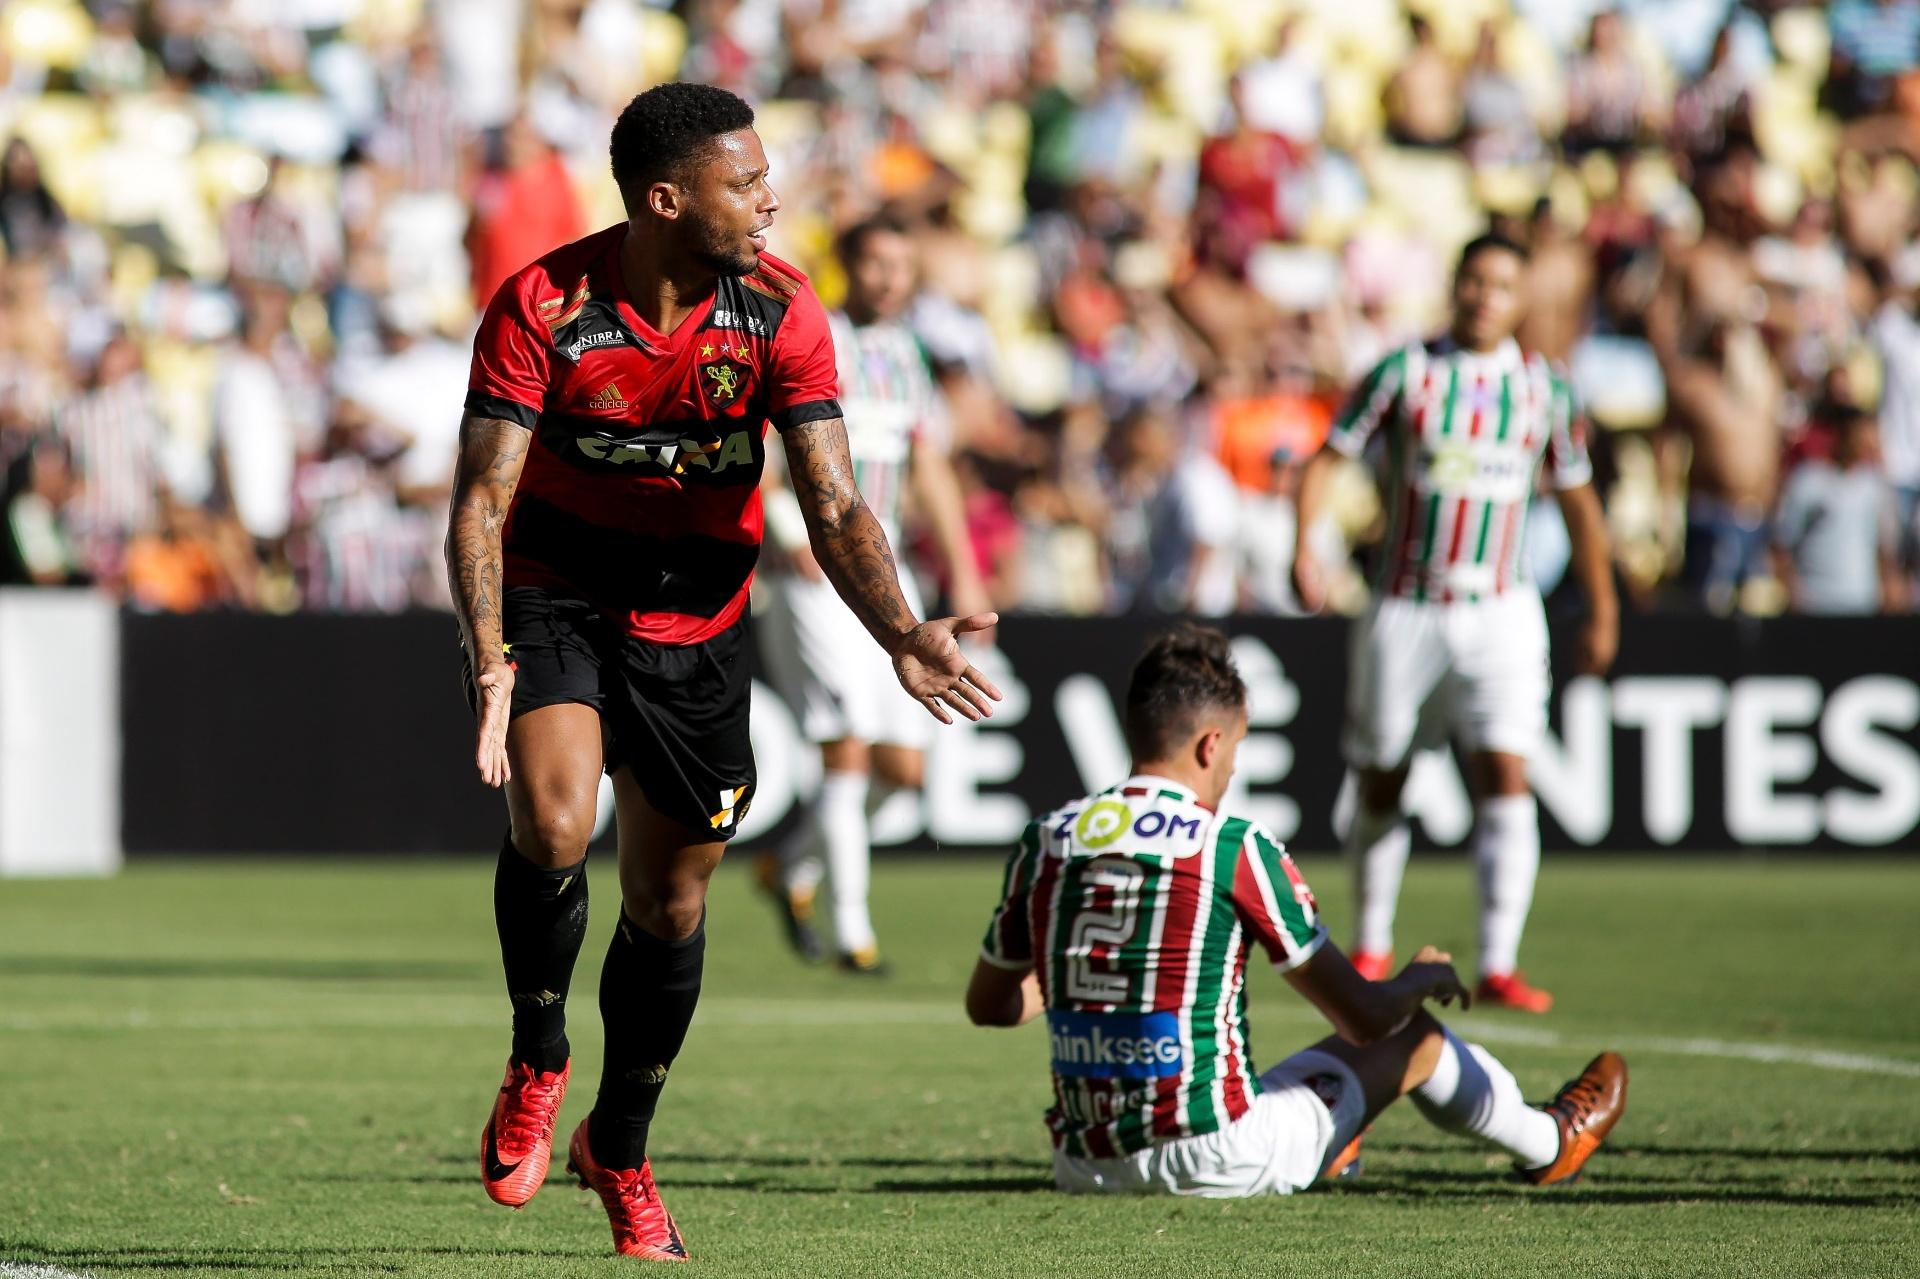 b48b4847eb Sport vence o Fluminense no Maracanã e sai da zona de rebaixamento -  25 11 2017 - UOL Esporte